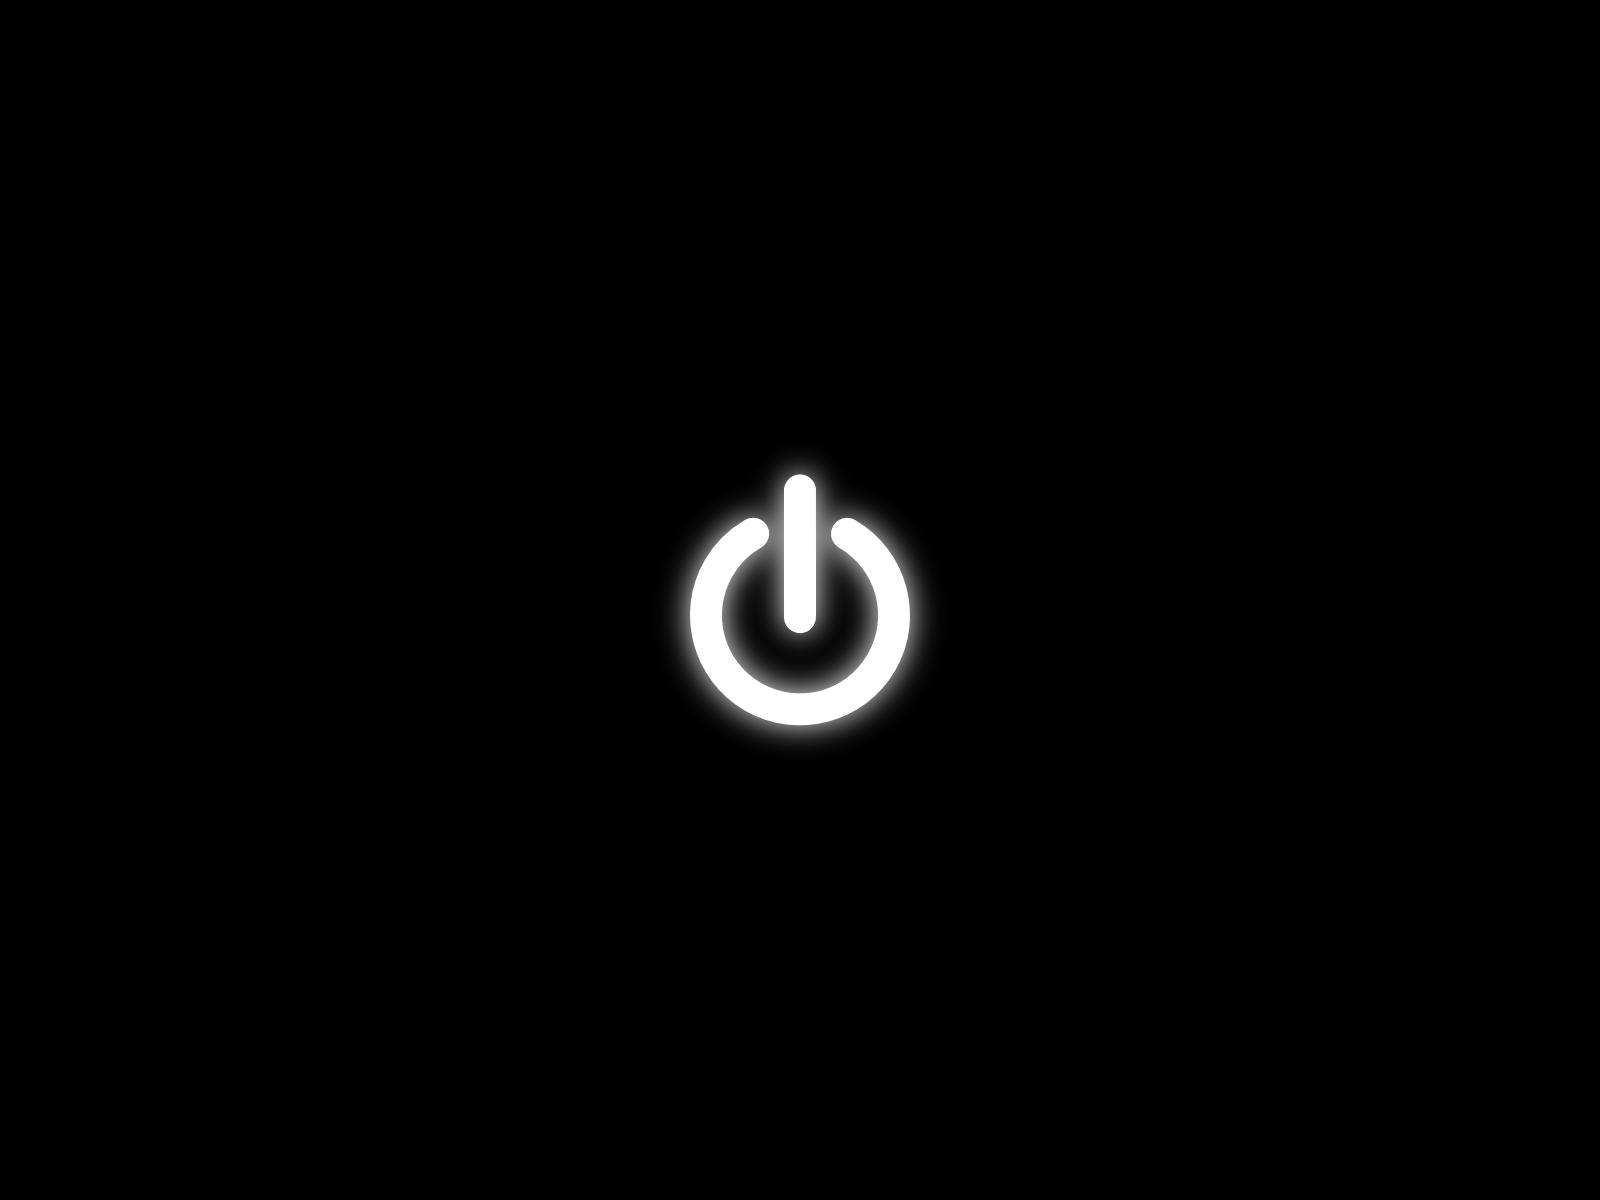 Minimal Power Button Logos HD Wallpaper My image 1600x1200